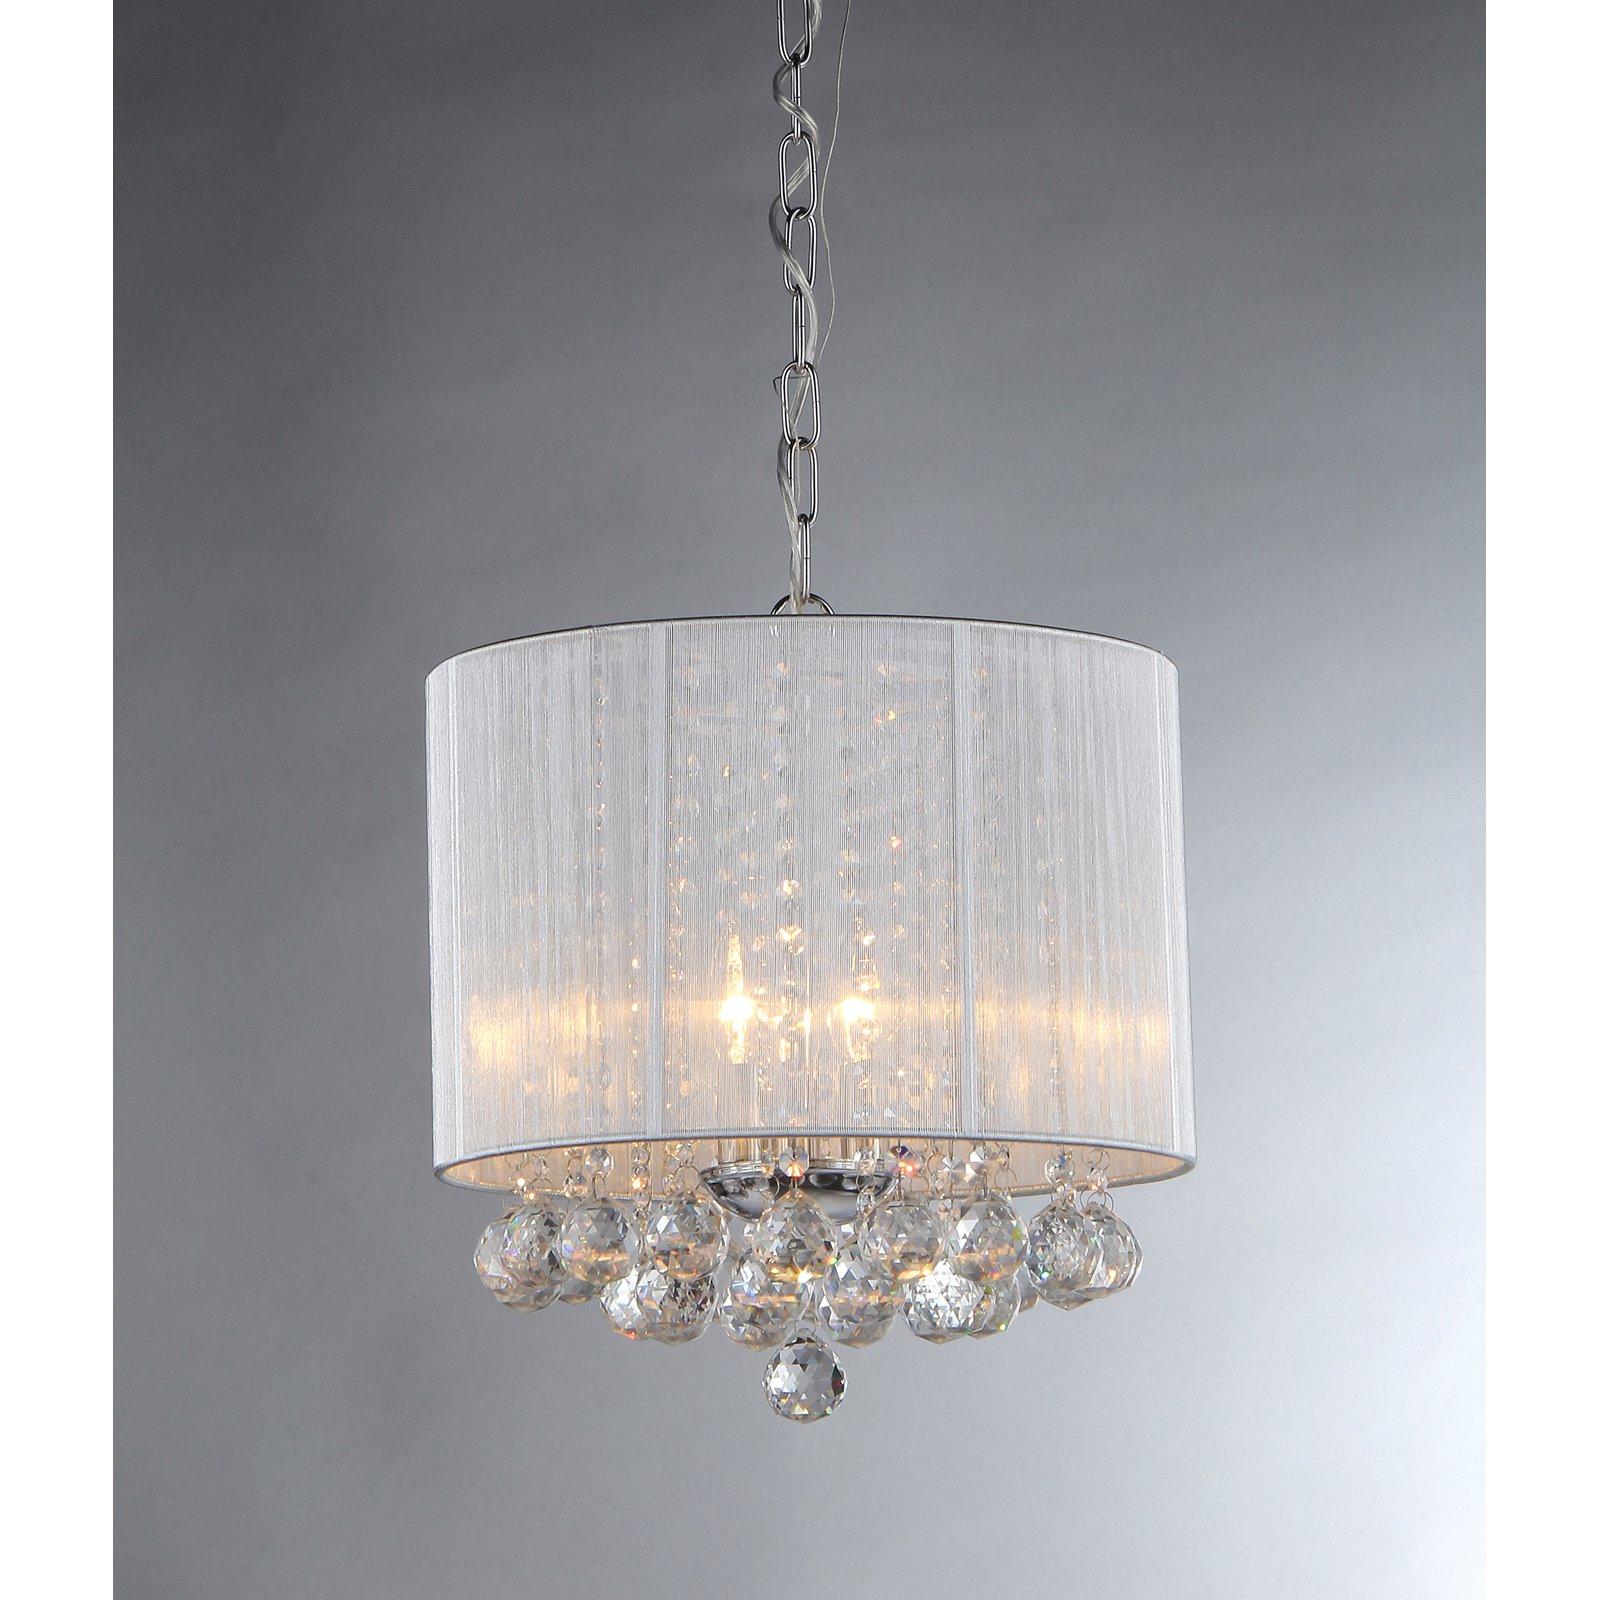 Warehouse of Tiffany Pinkys Platter RL1138 Crystal Pendant Light